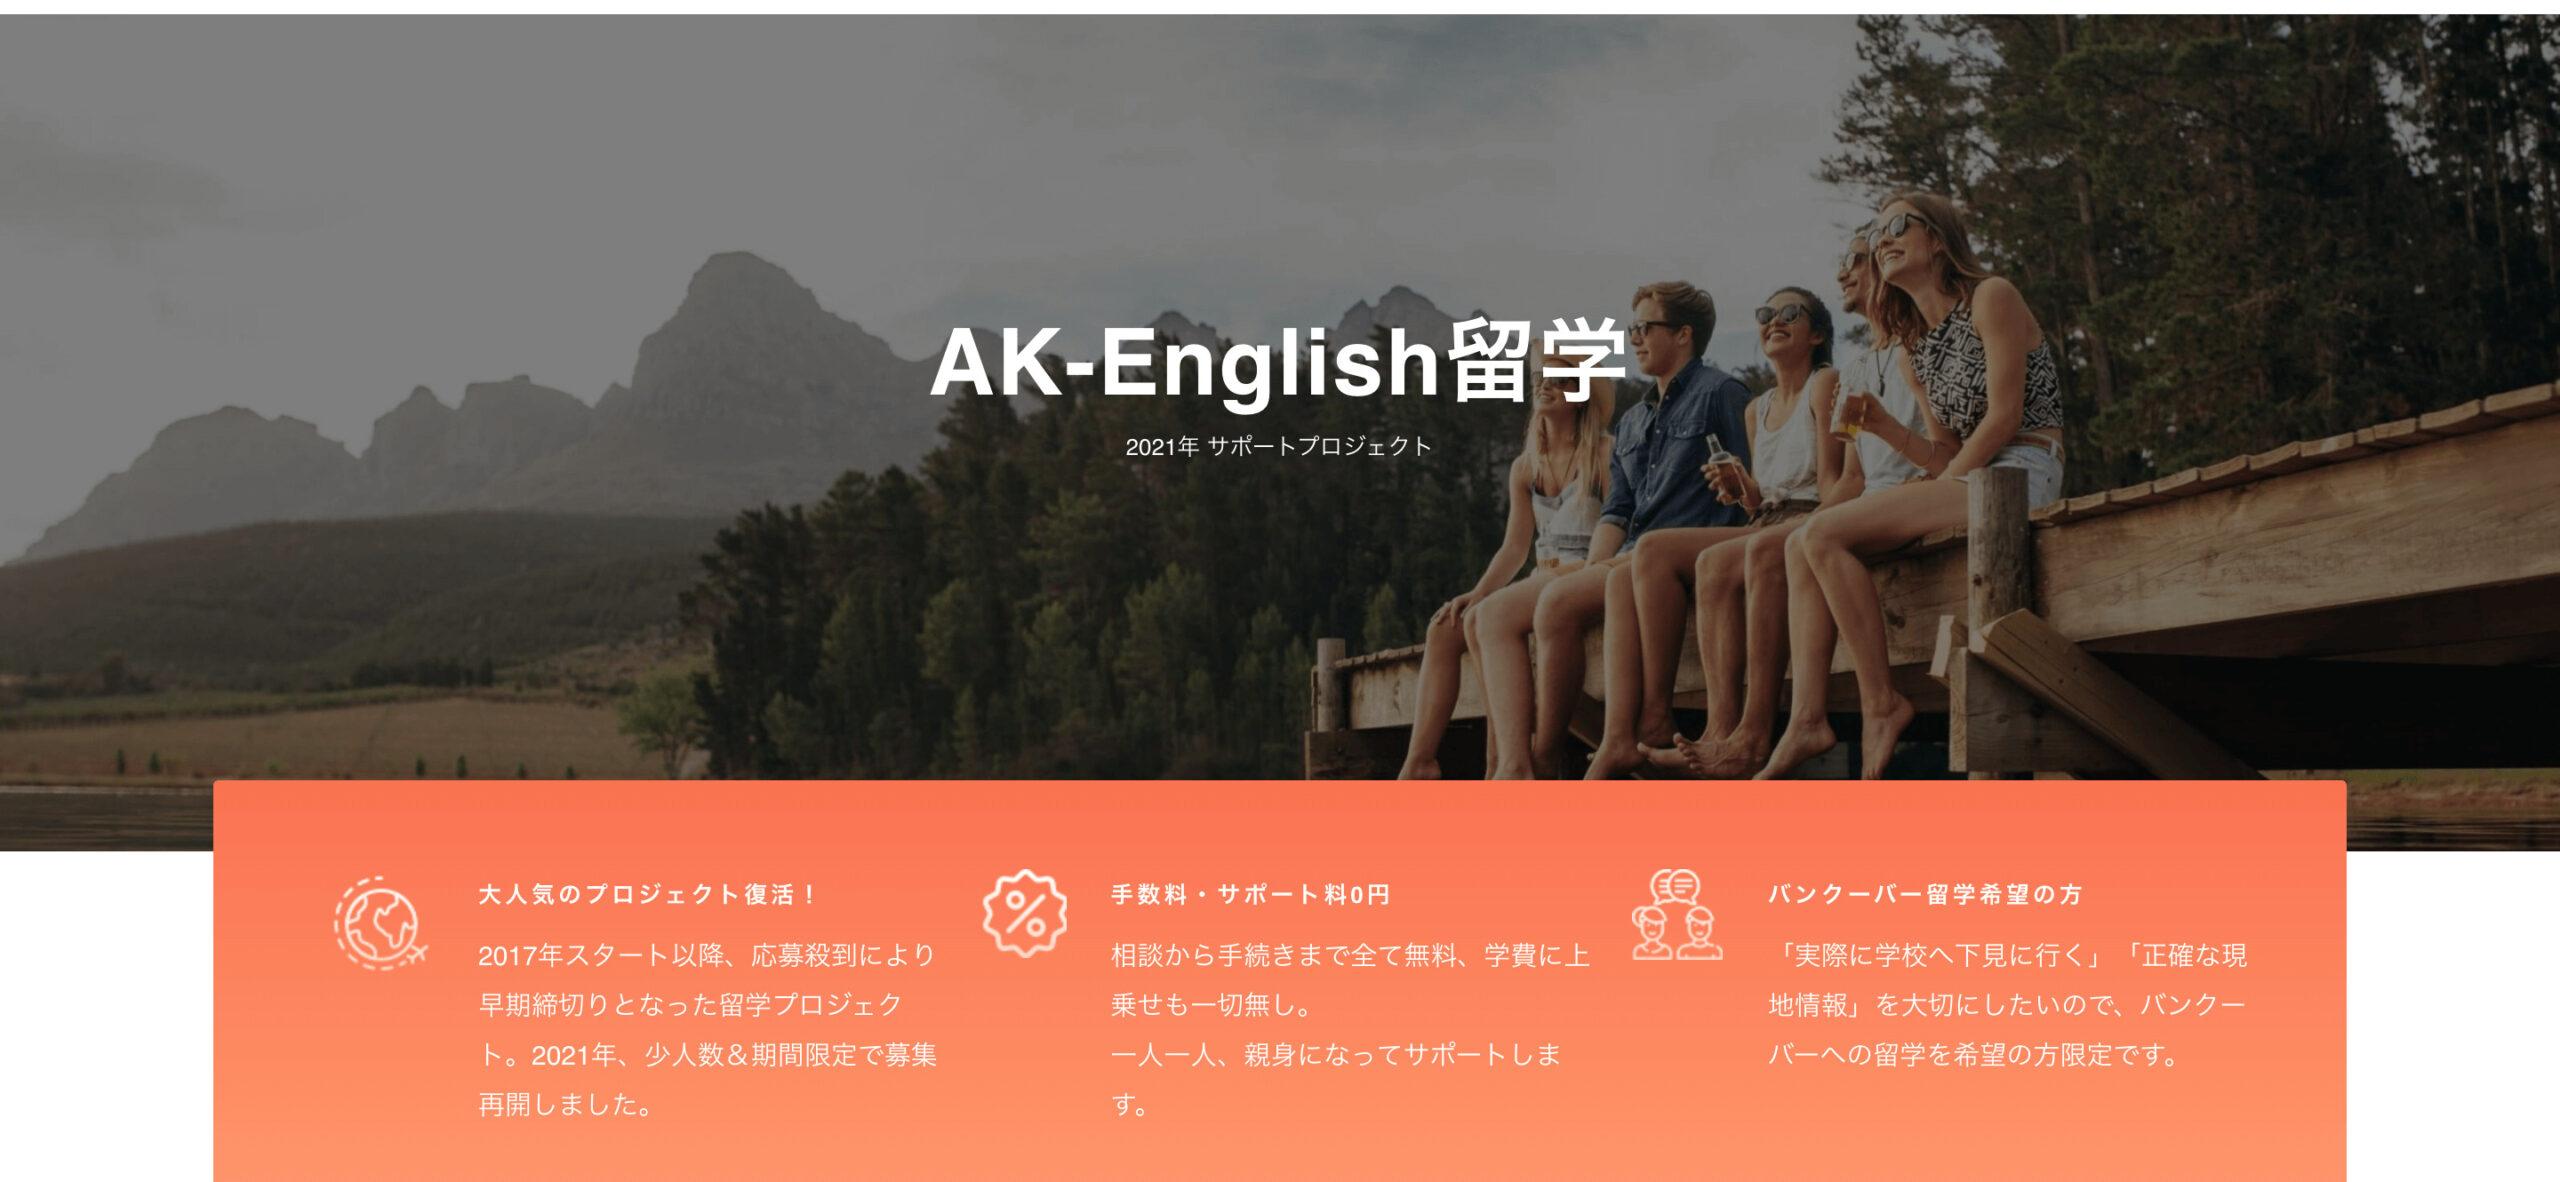 youtube_english_study abroad